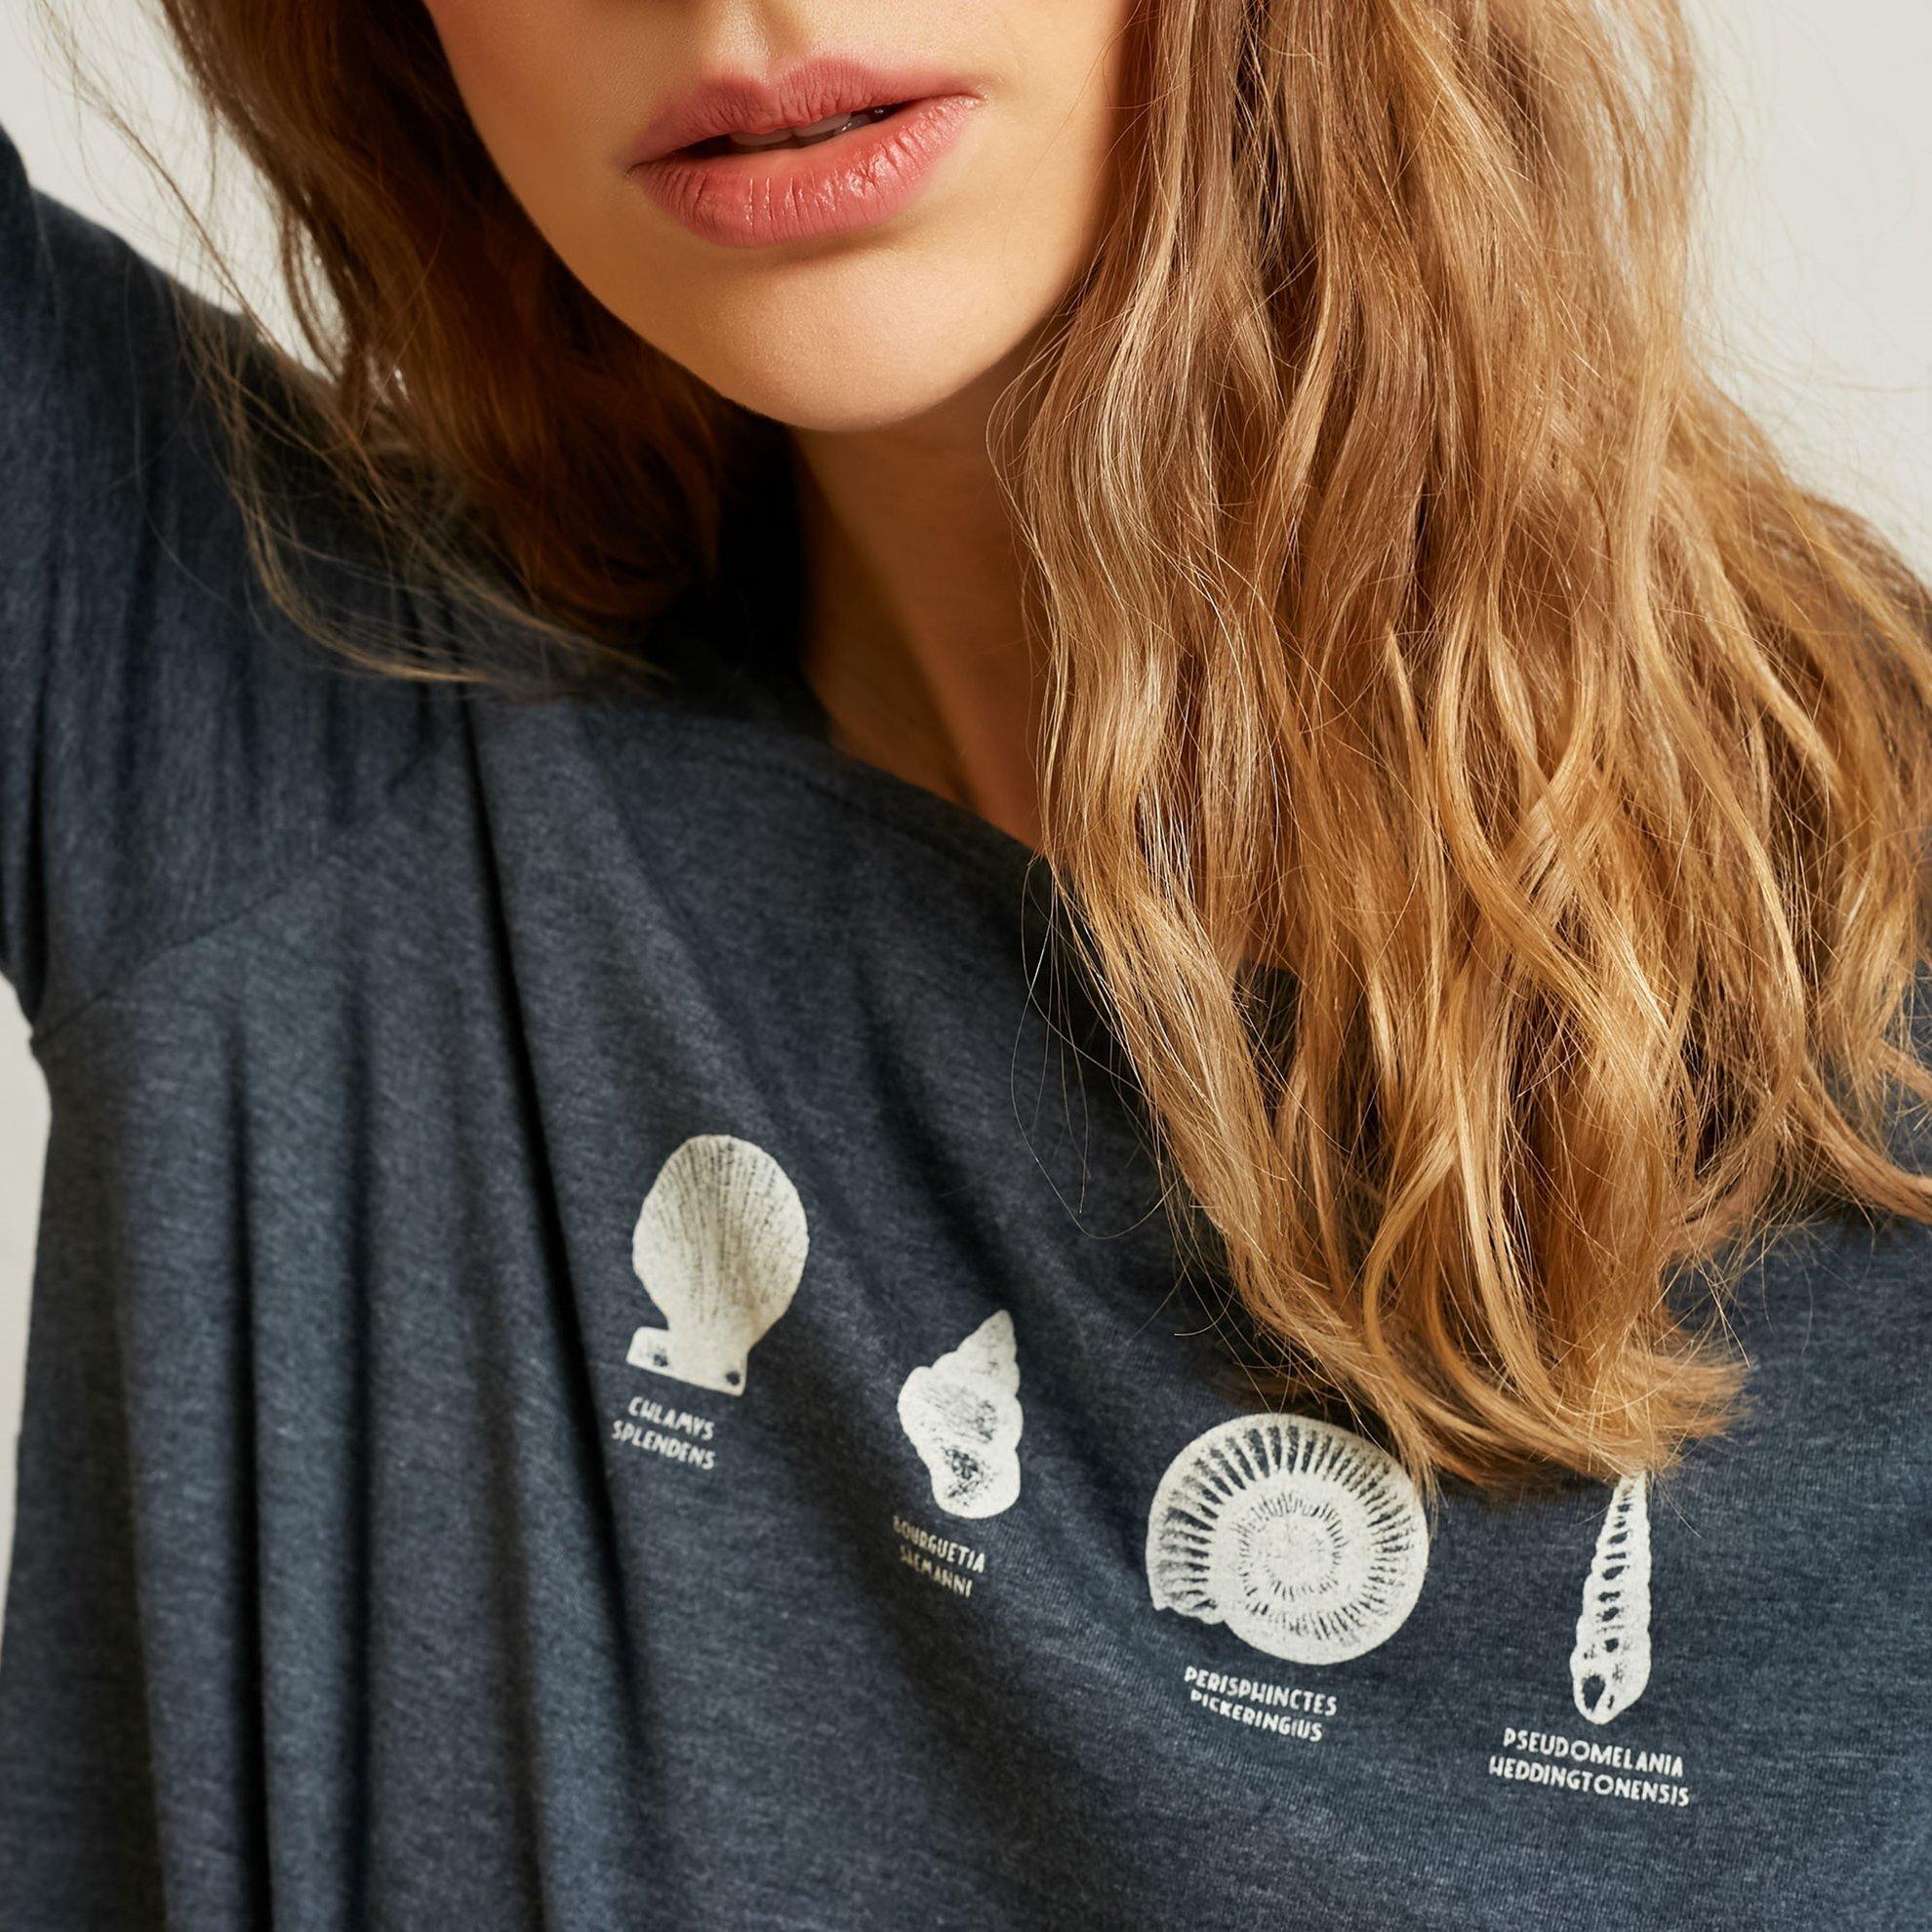 Square Neck Printed T-Shirt